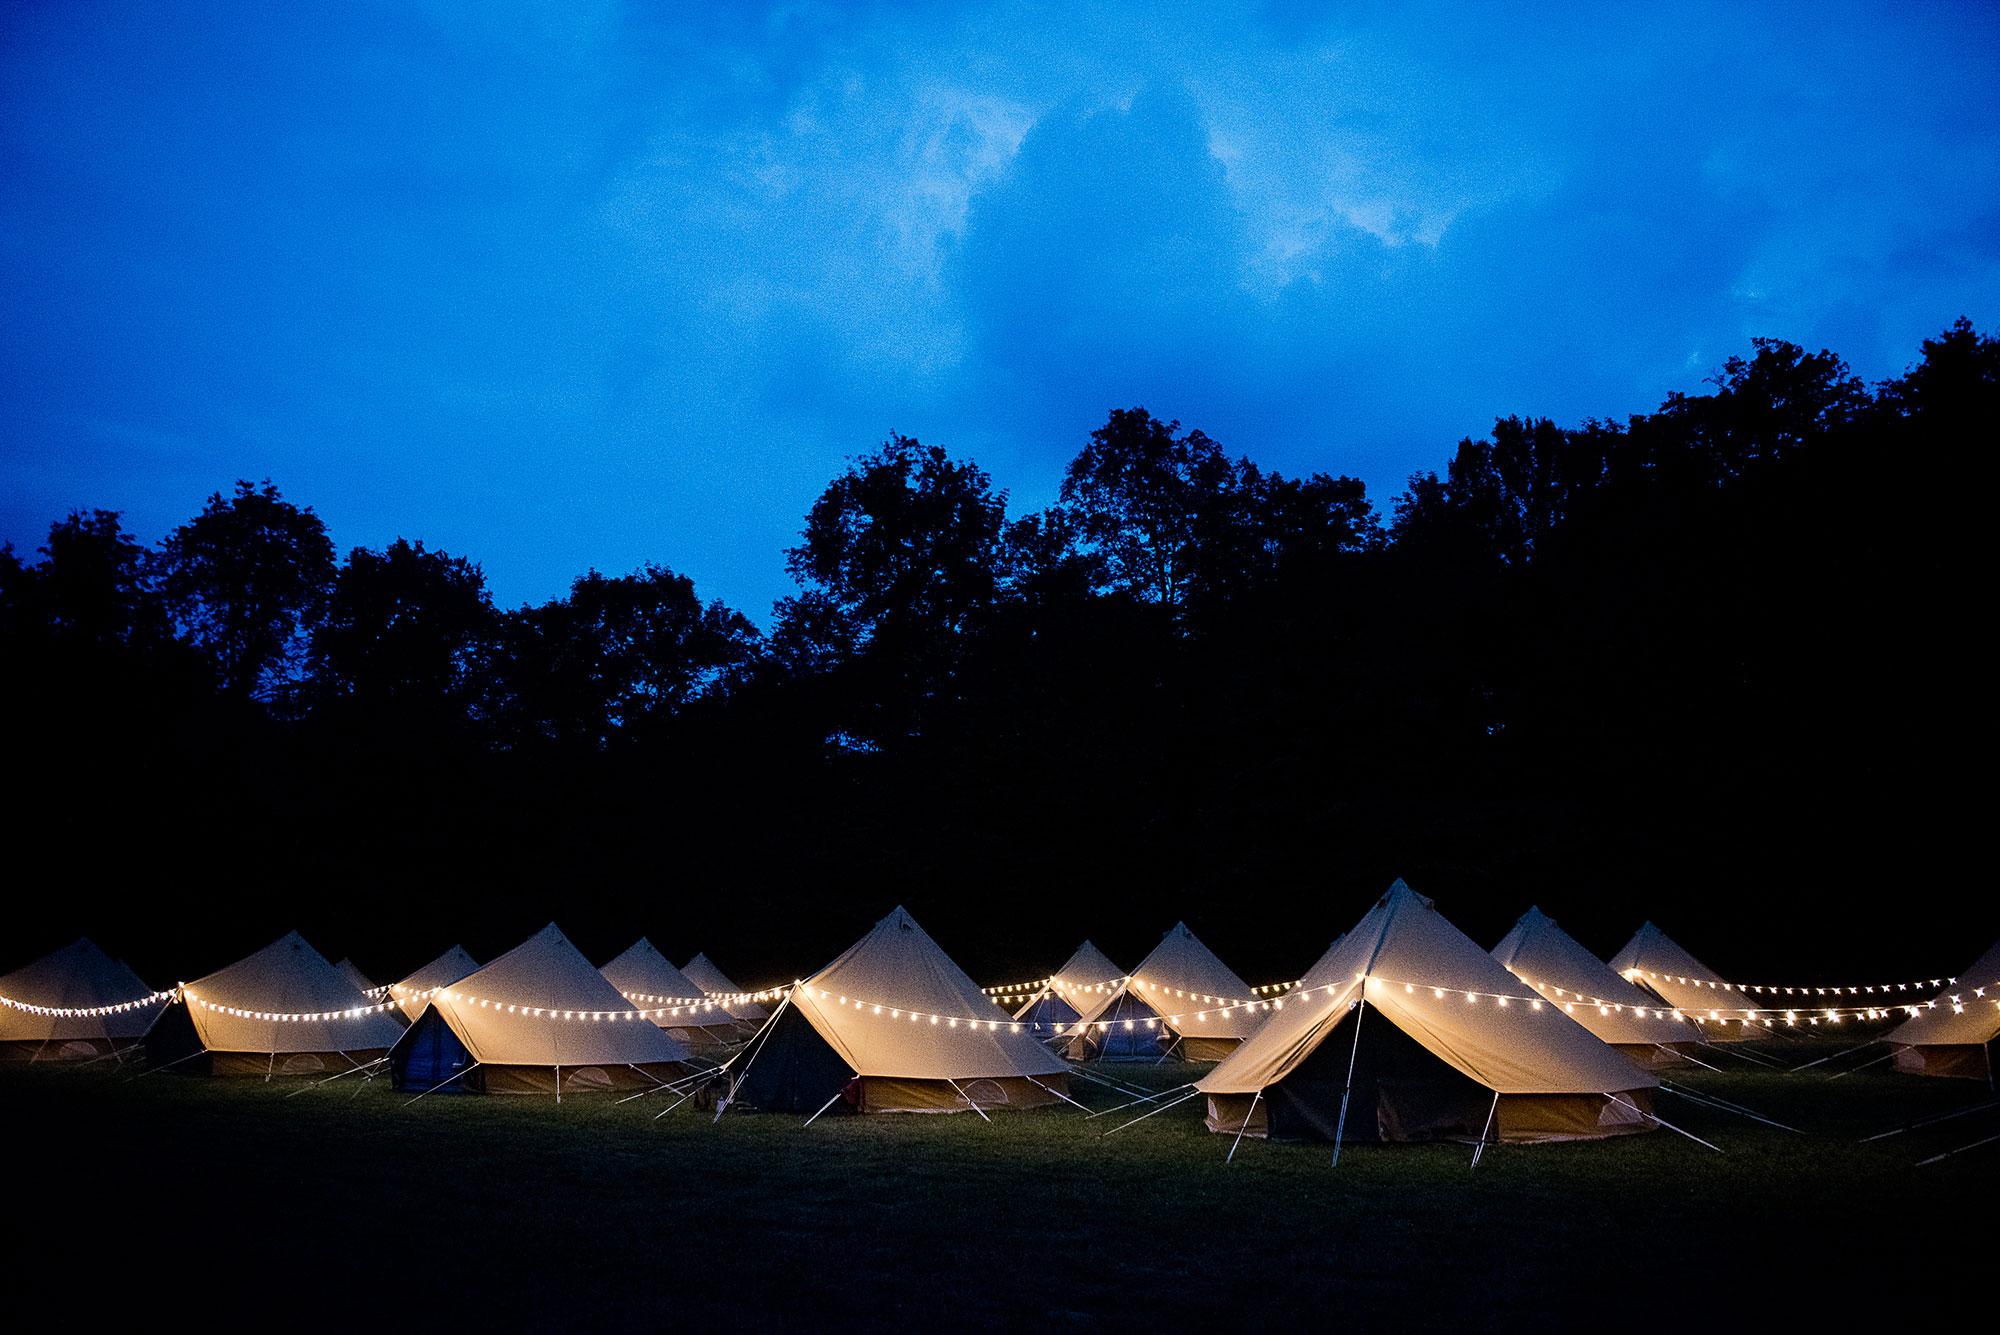 wedding_glamping_tents_adirondack_evening.jpg